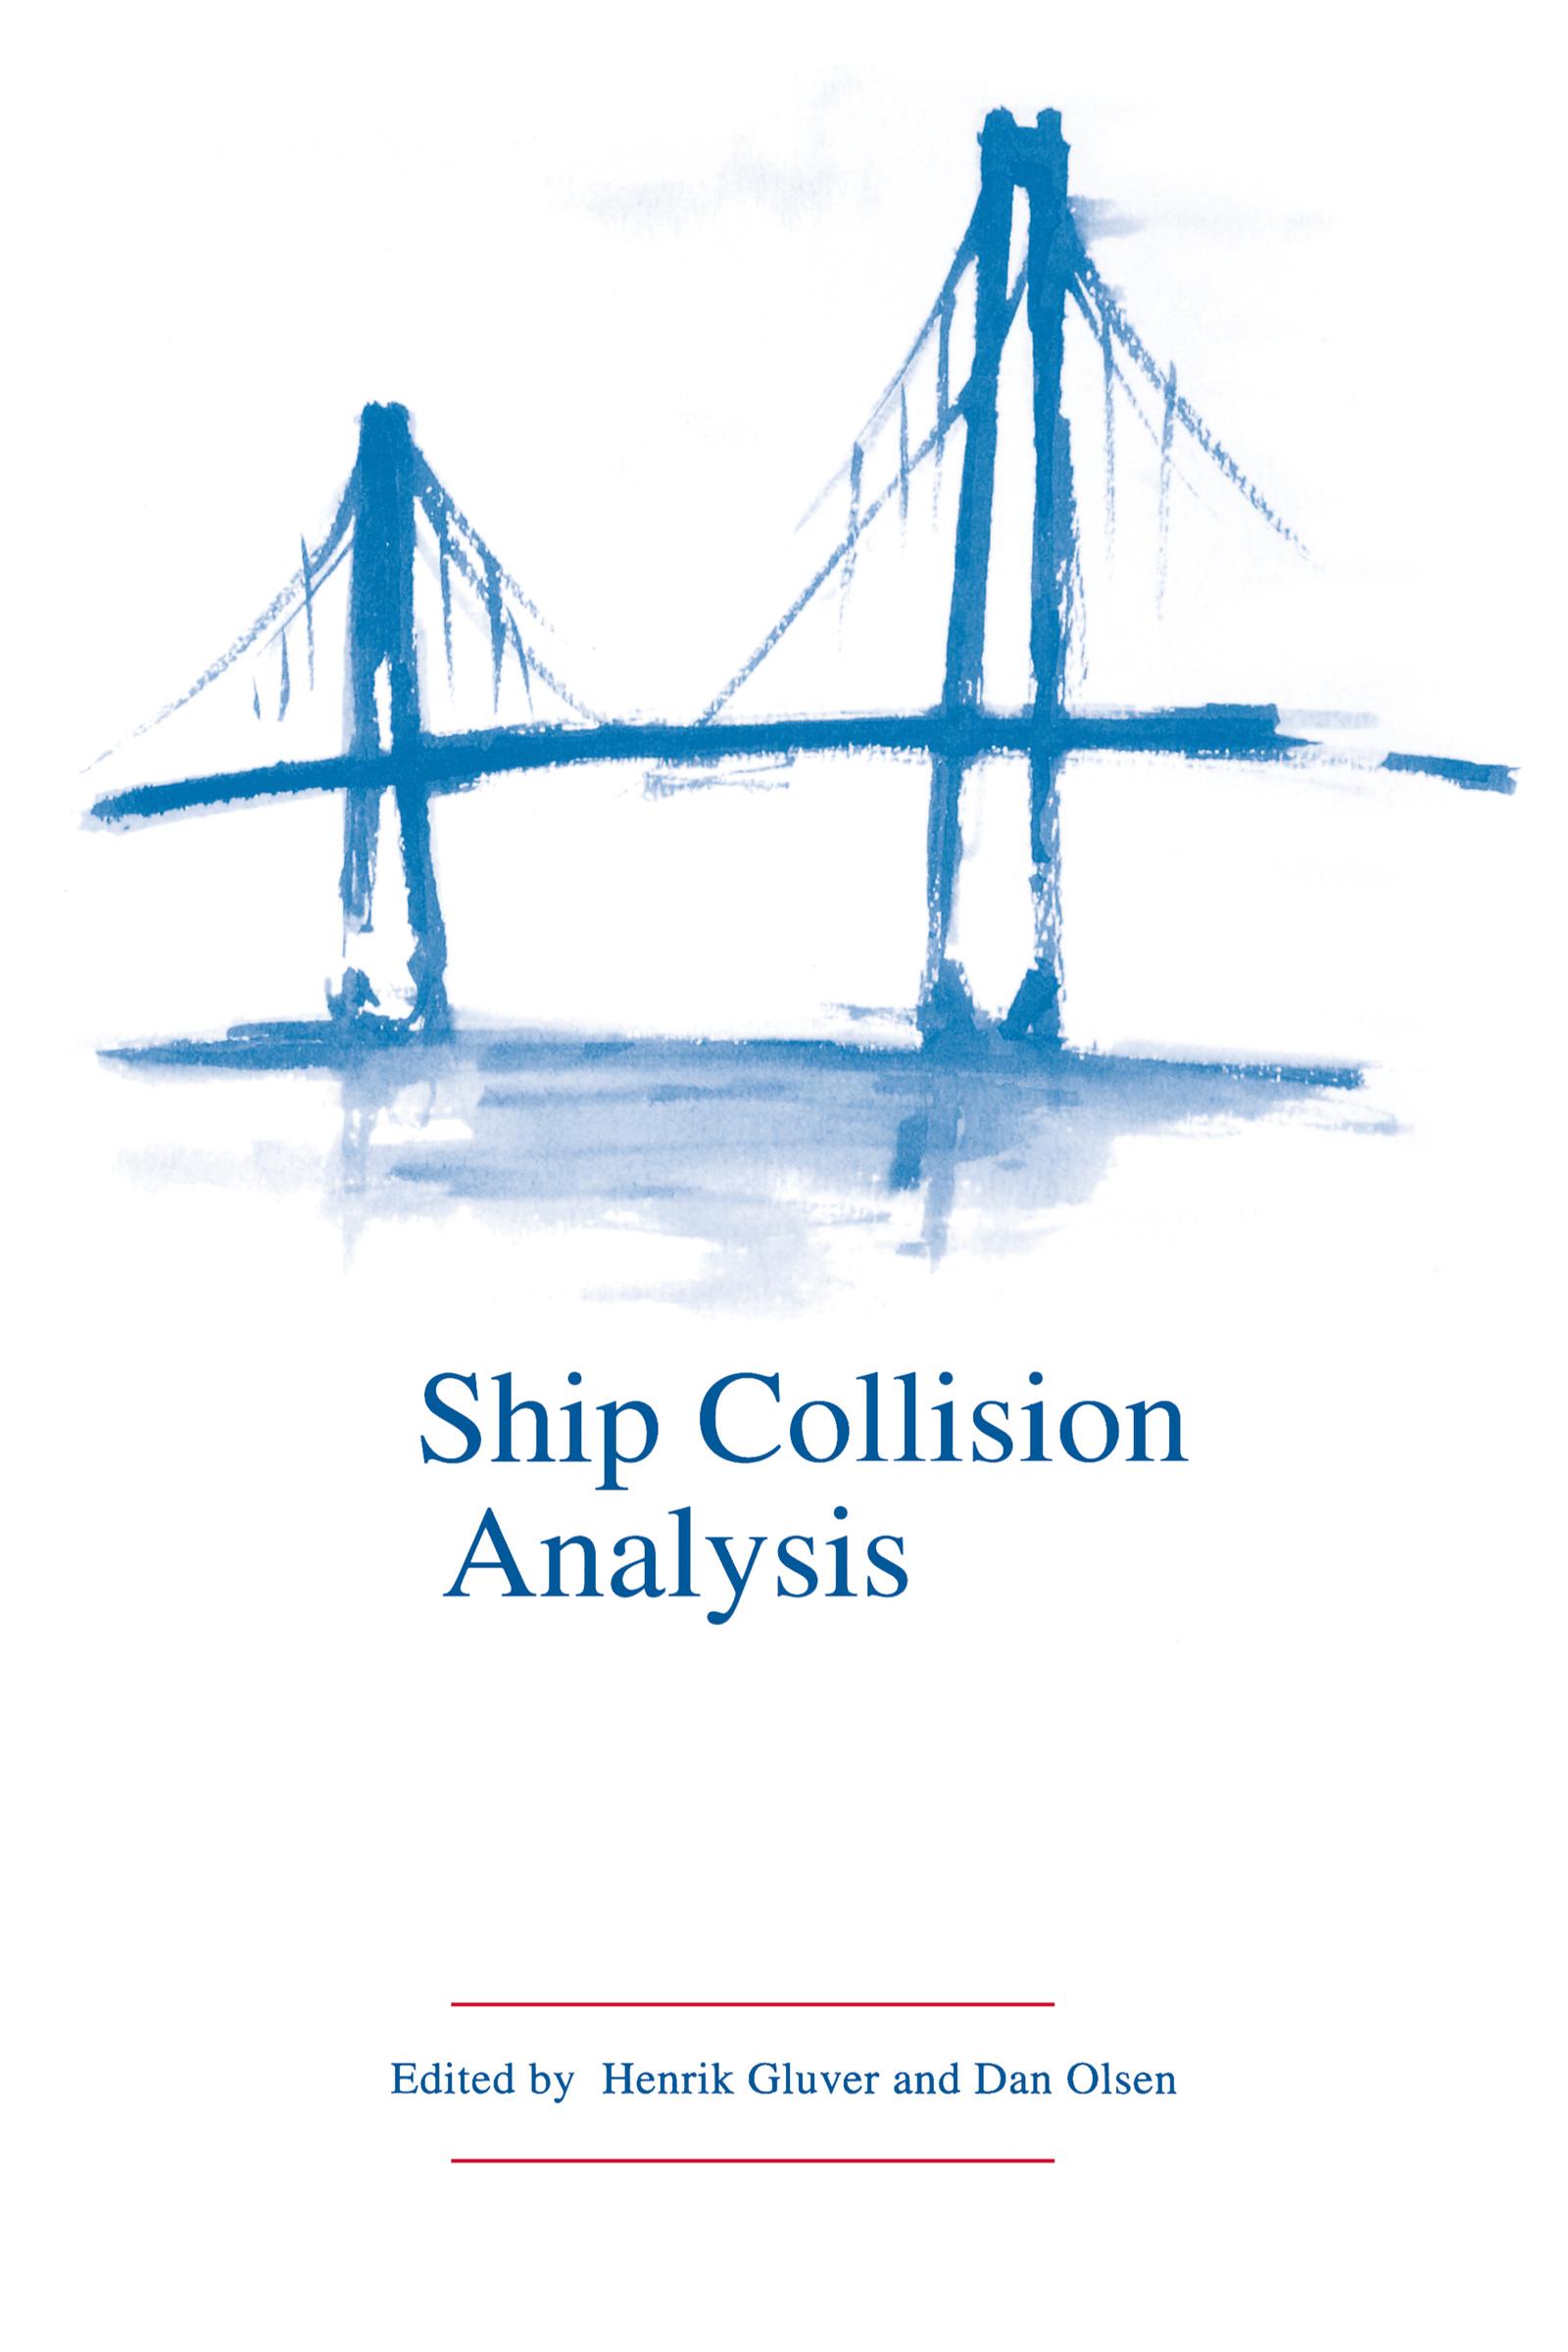 Ship Collision Analysis